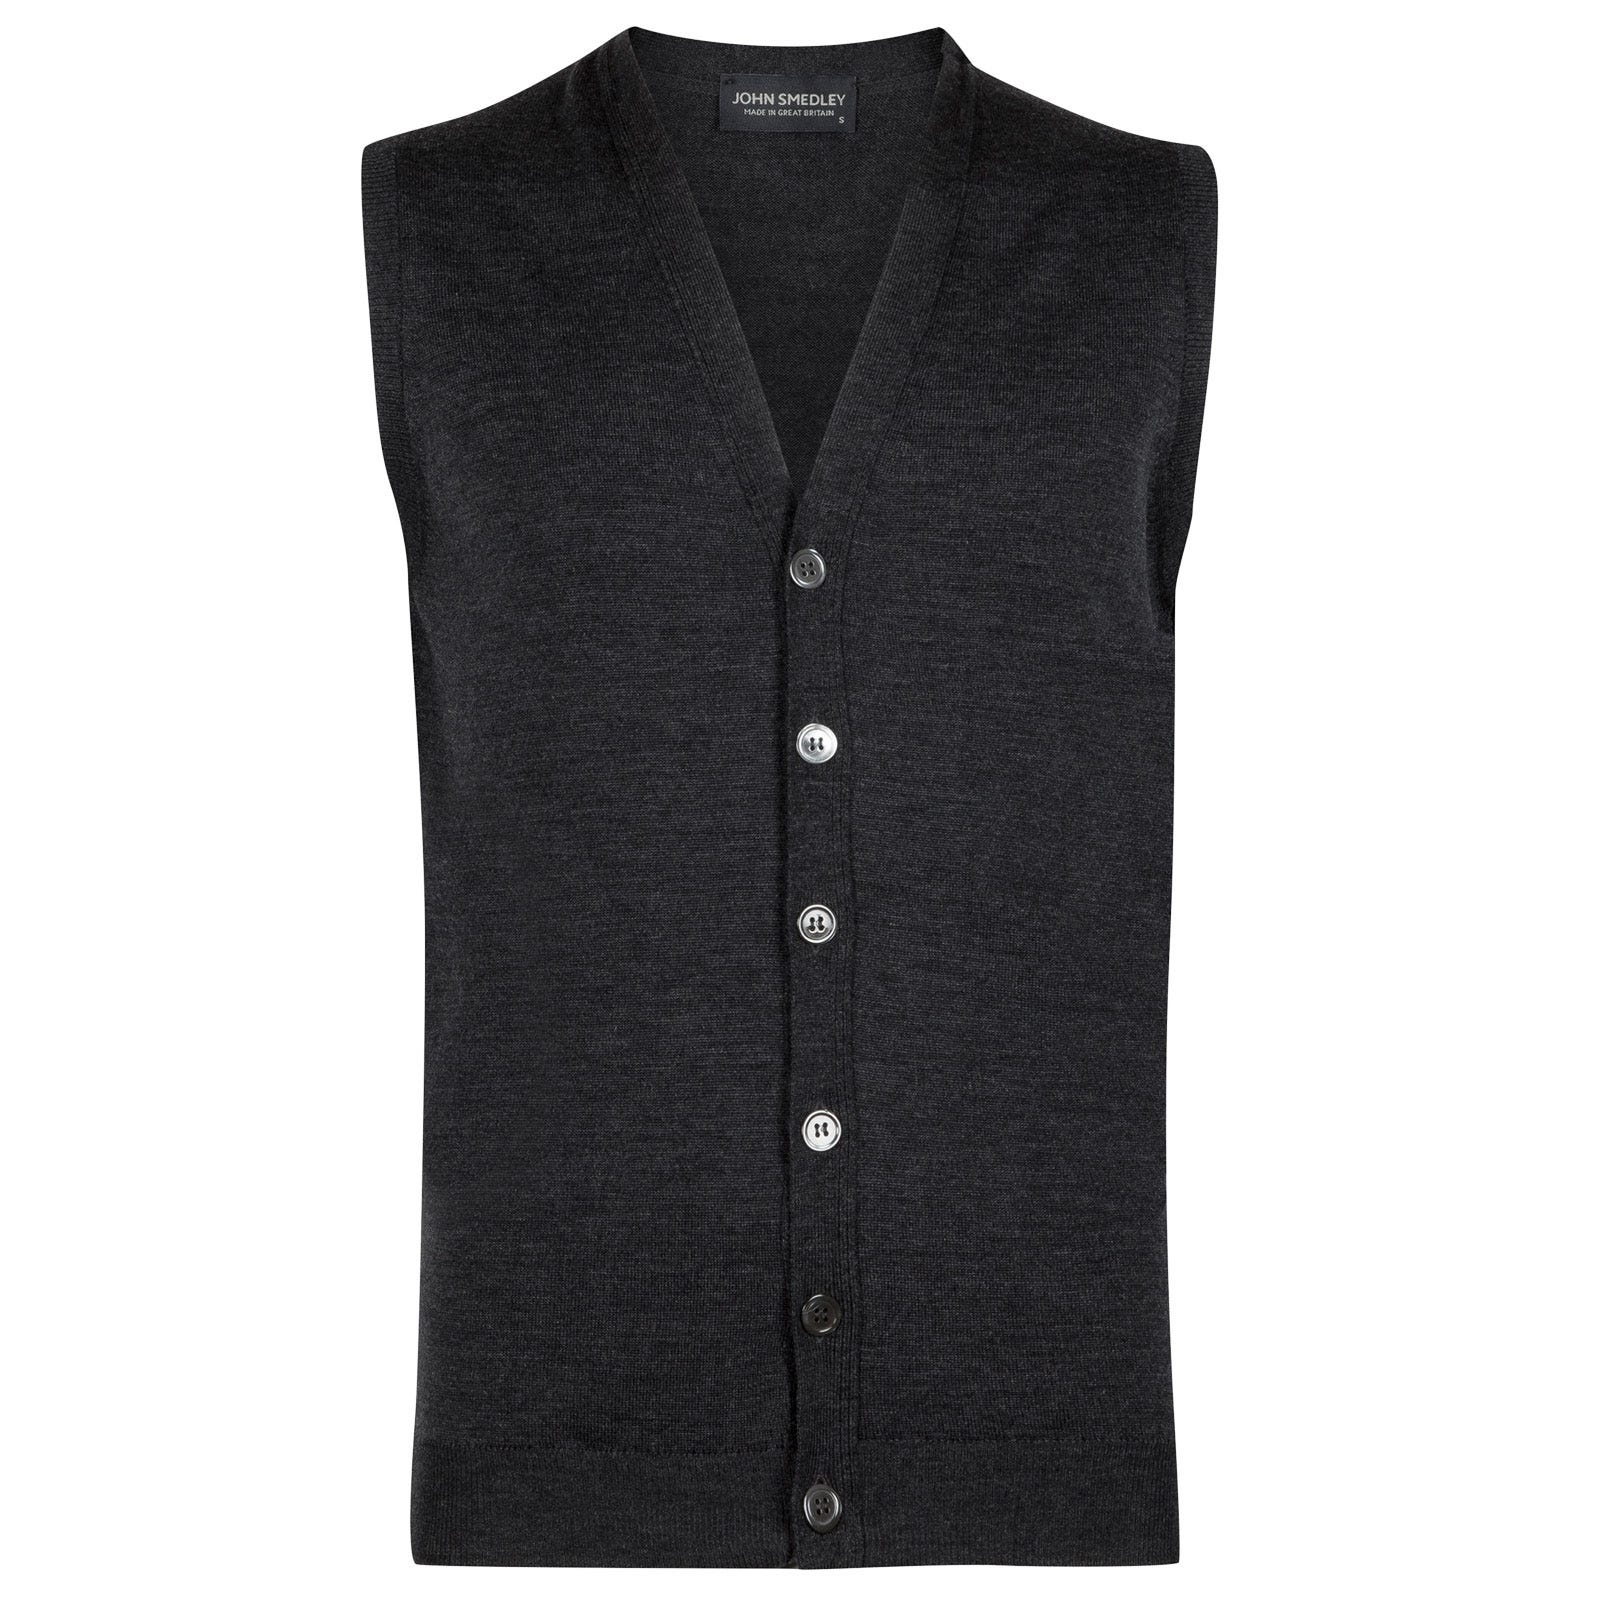 John Smedley stavely Merino Wool Waistcoat in Charcoal-S